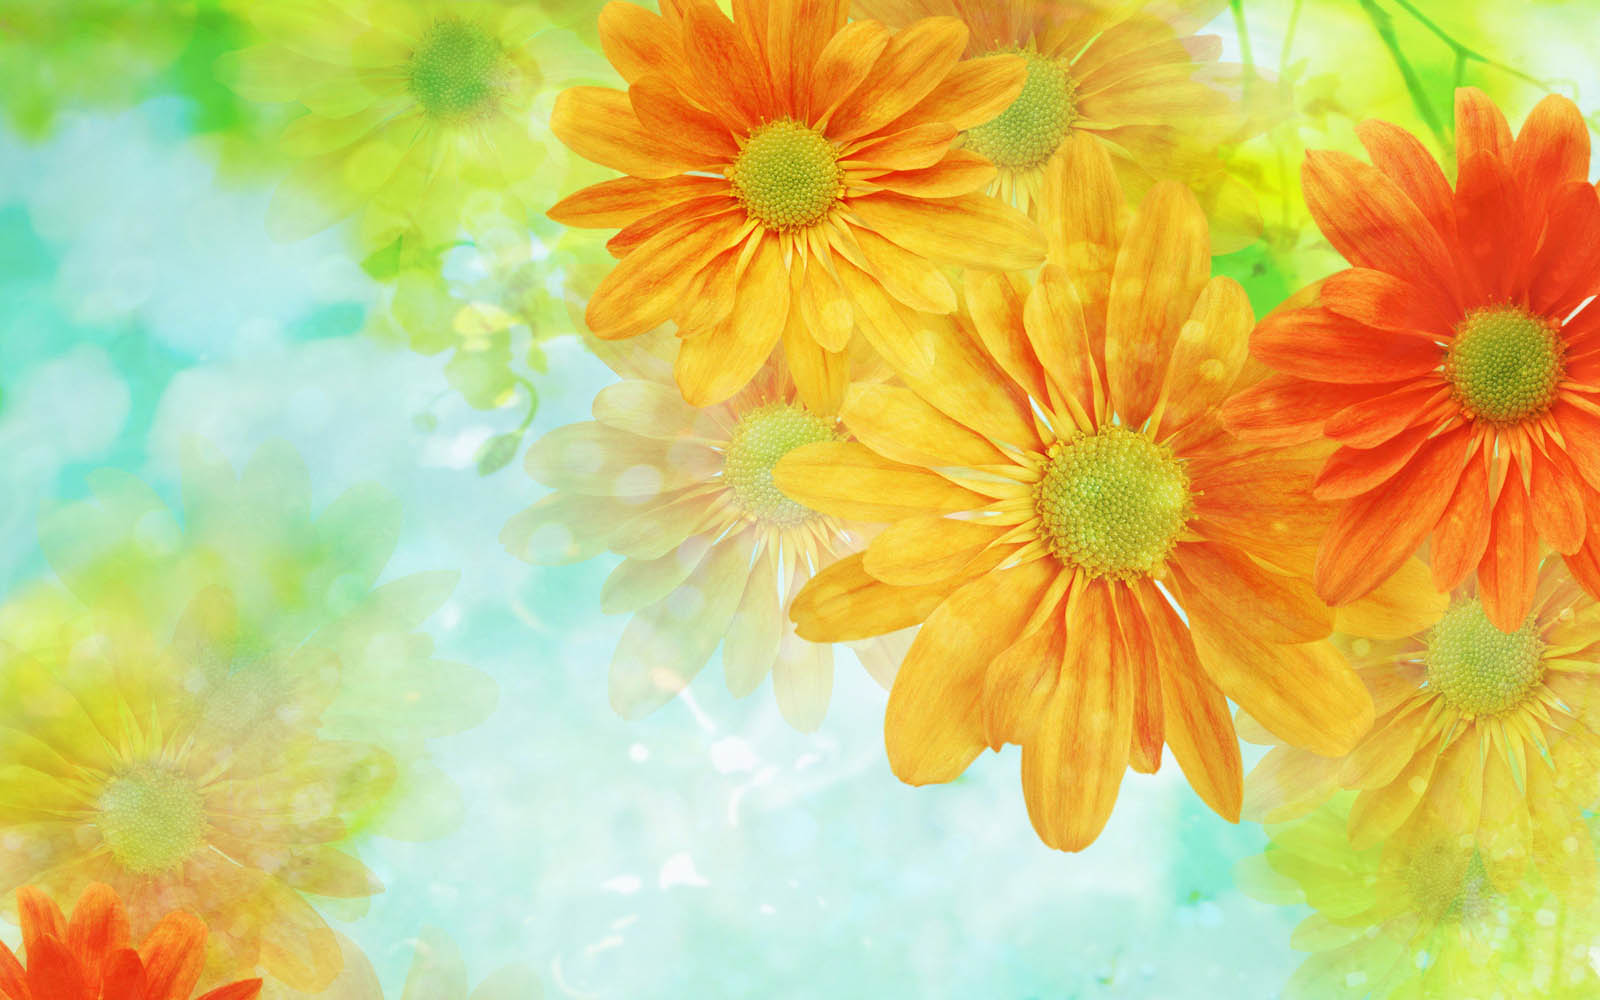 art flowers background wallpaper -#main